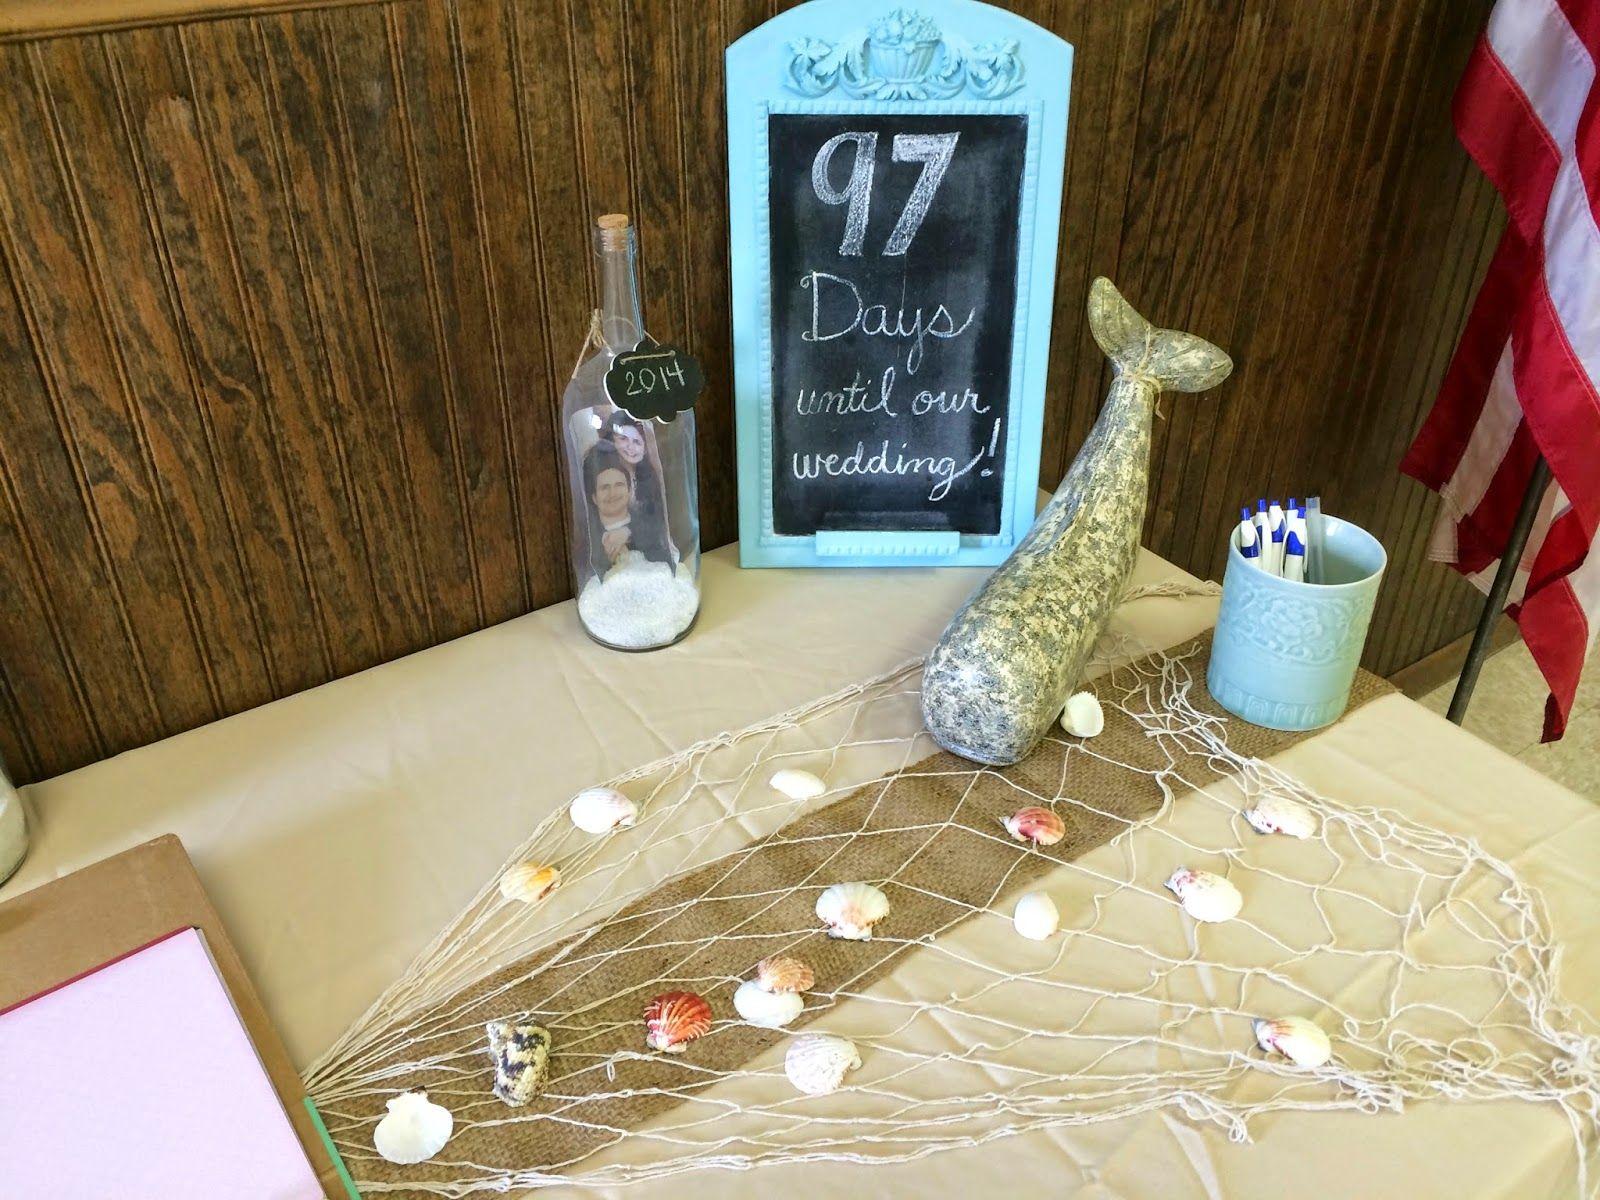 wedding shower centerpieces beach theme%0A How to Throw A Beach Themed Wedding Shower  Details on DIY decor  food